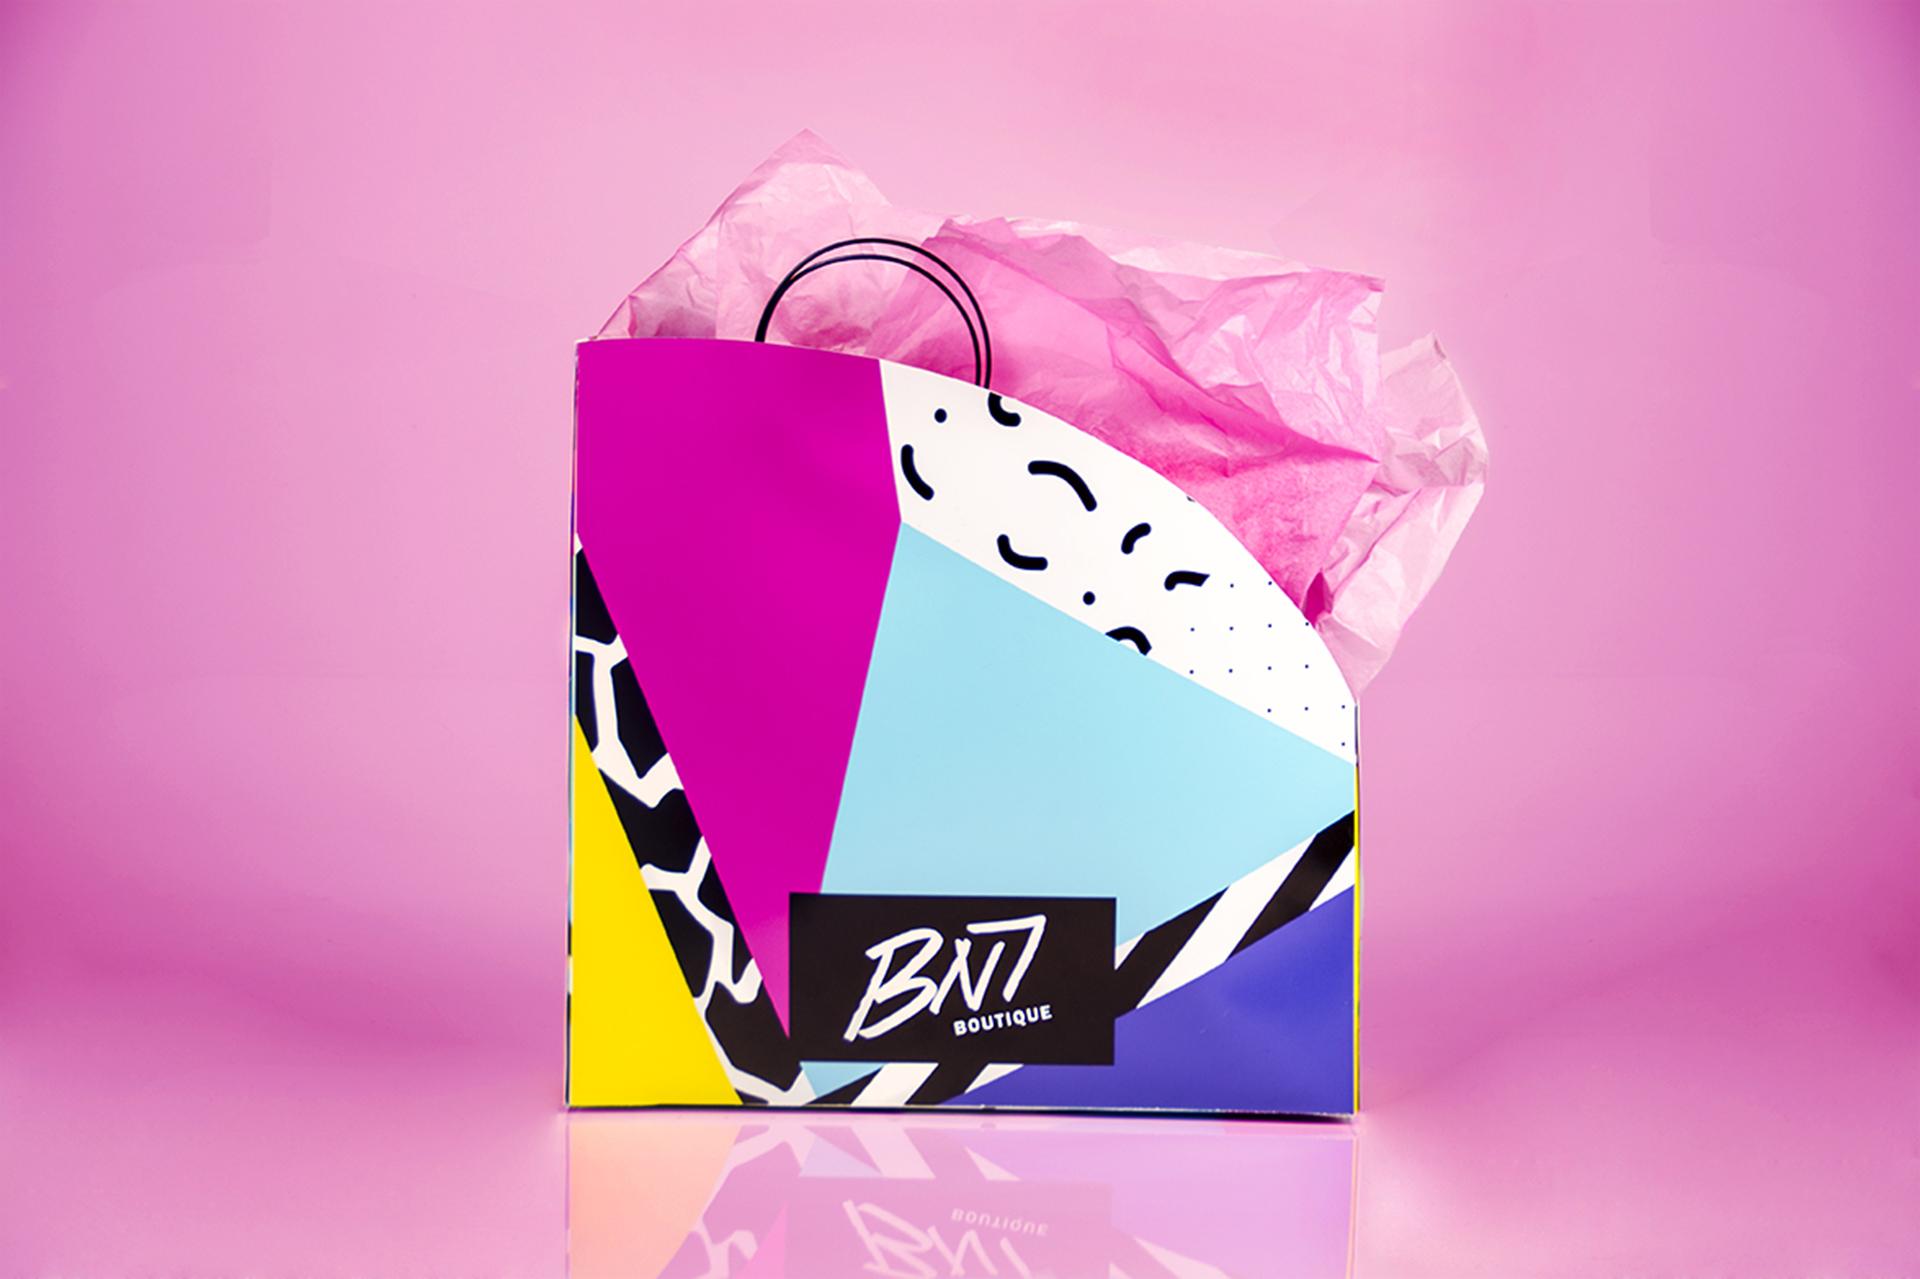 BN7_Bags_2_Single.jpg